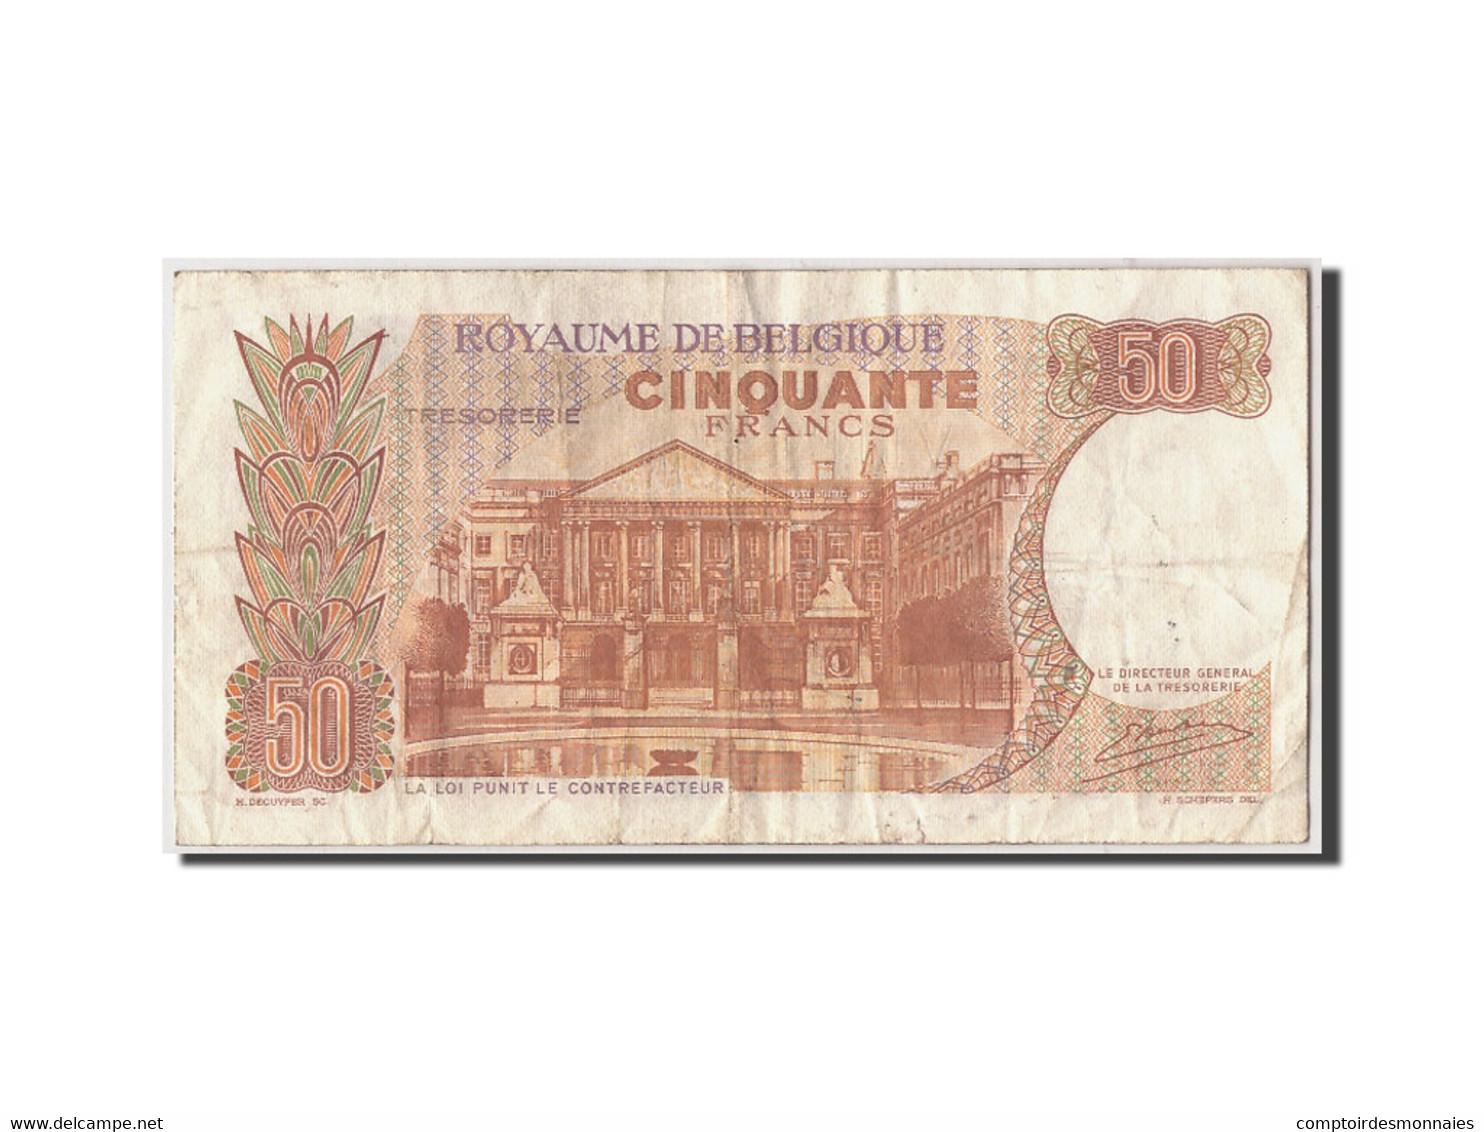 Belgique, 50 Francs, 1966, KM:139, 1966-05-16, TB - [ 6] Staatskas